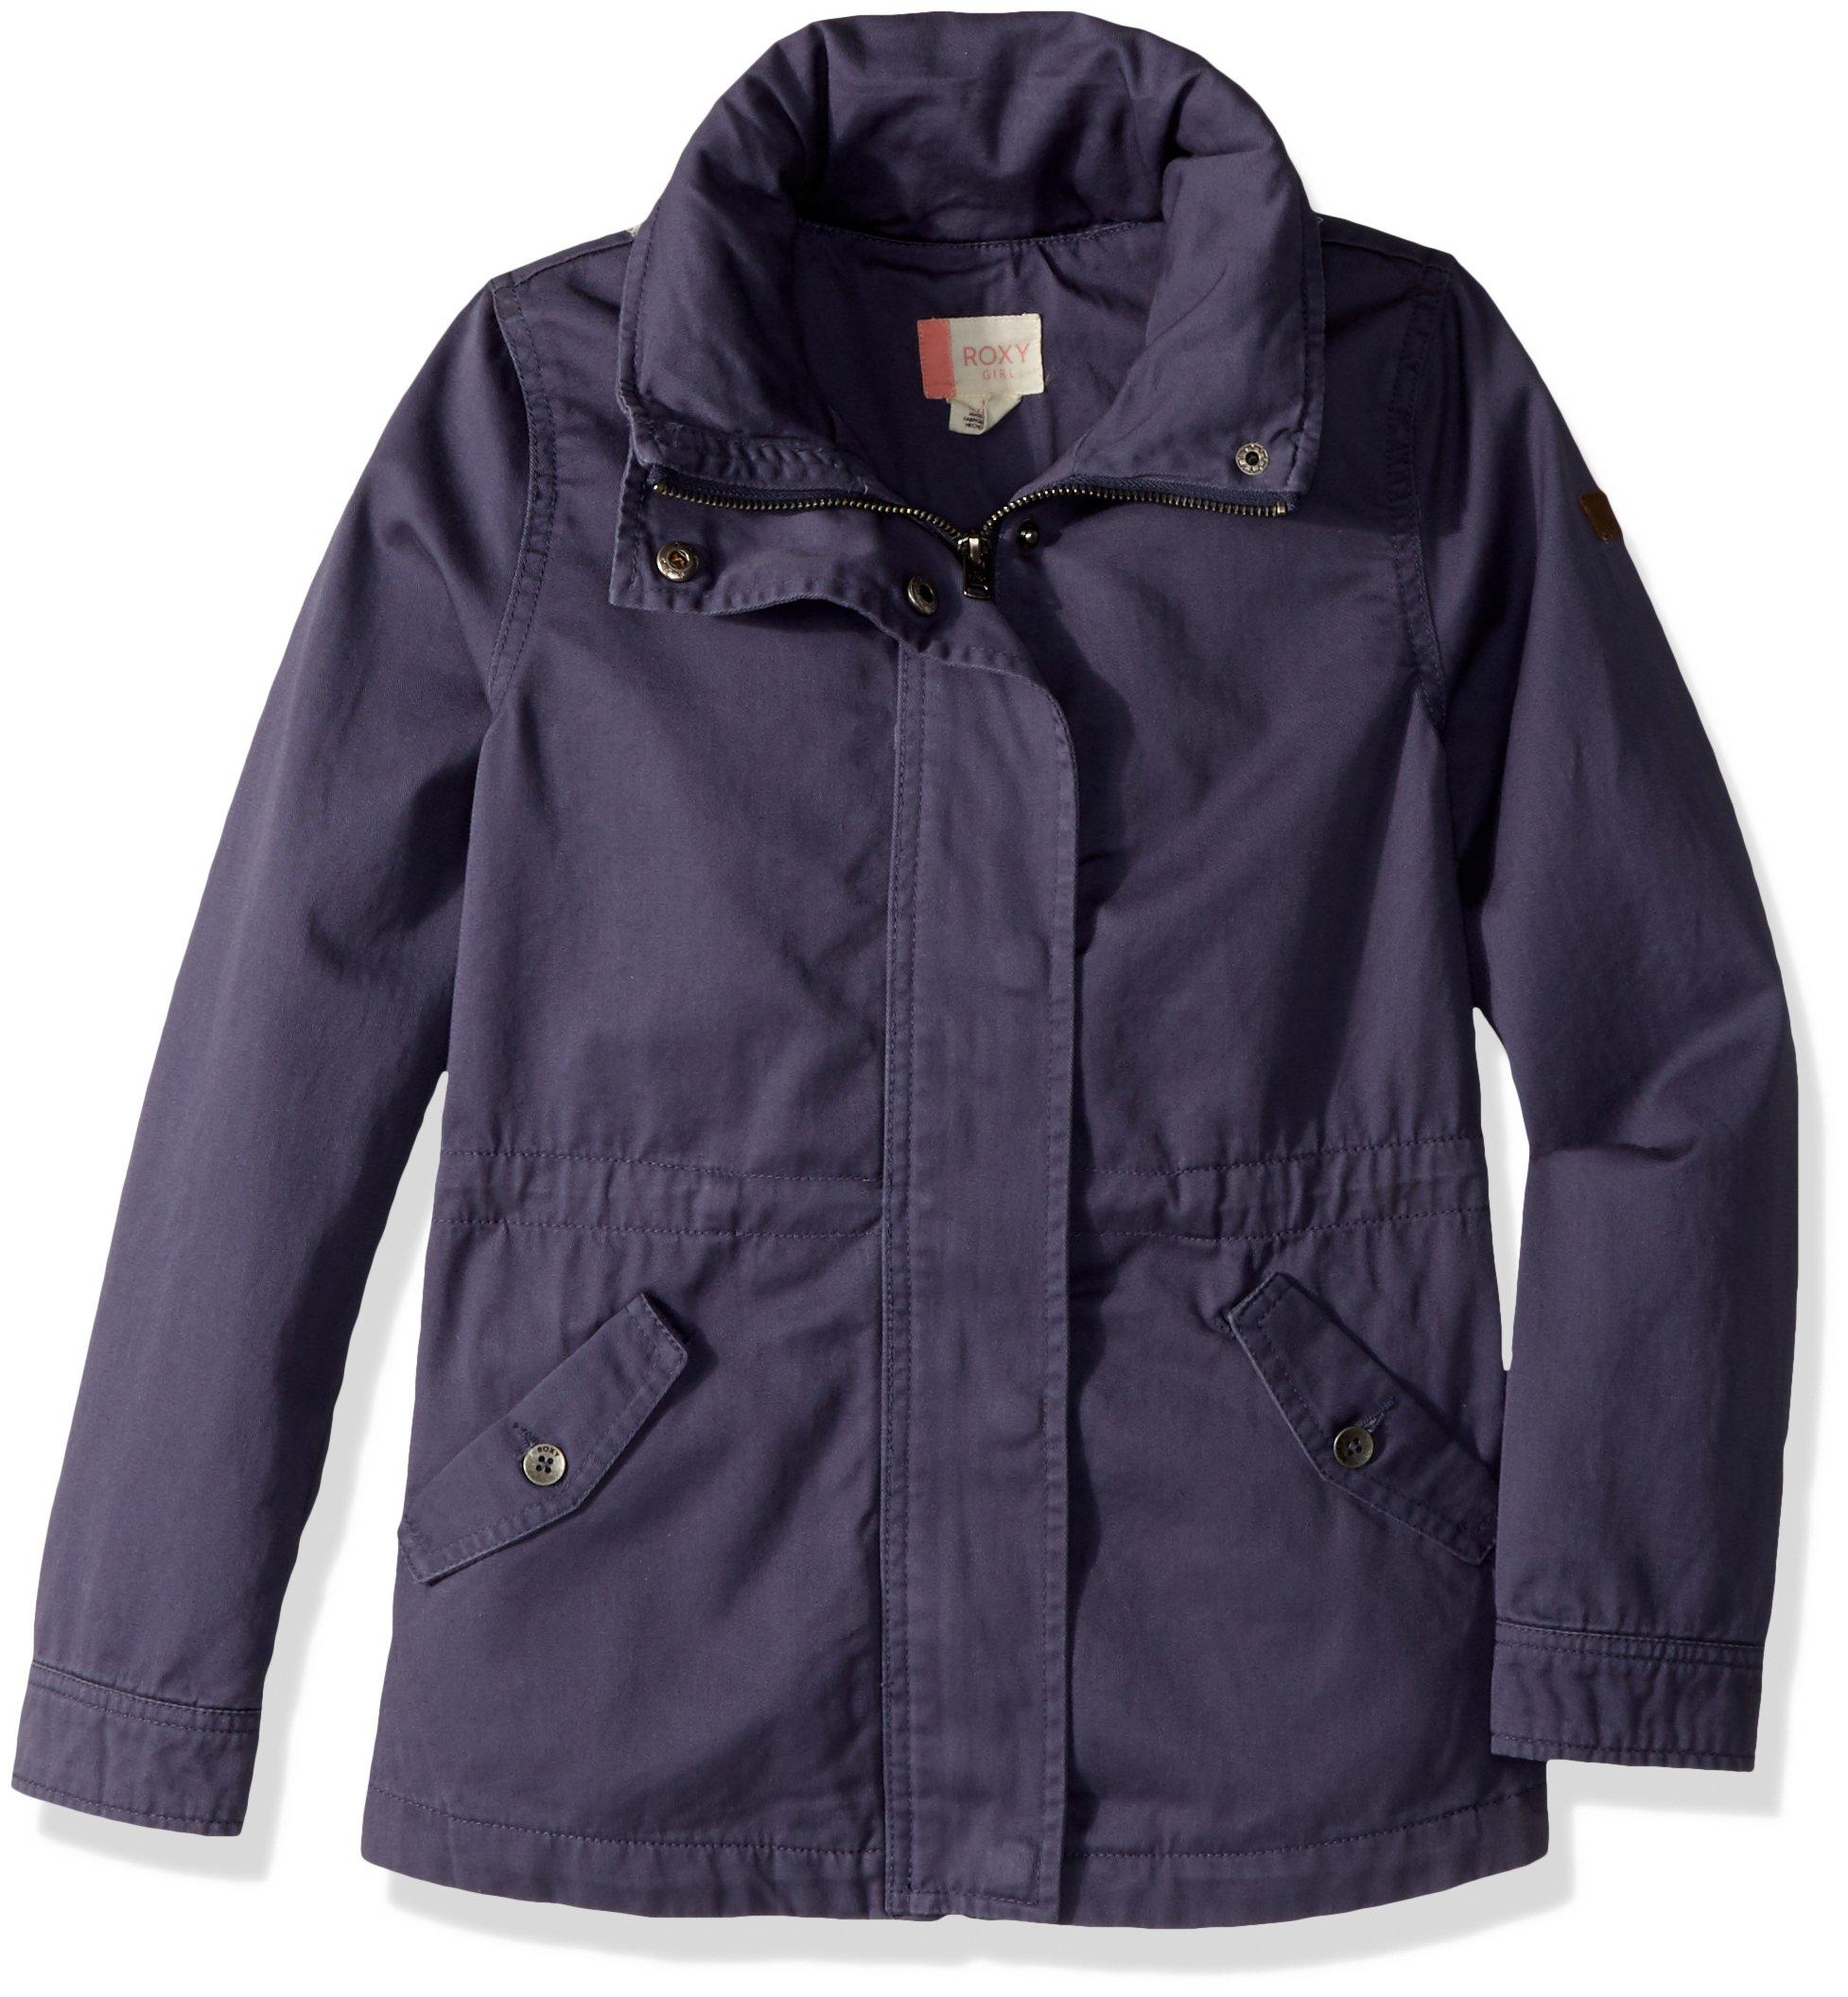 Roxy Big Girls' Military Jacket, Night Shadow Blue, 14/XL